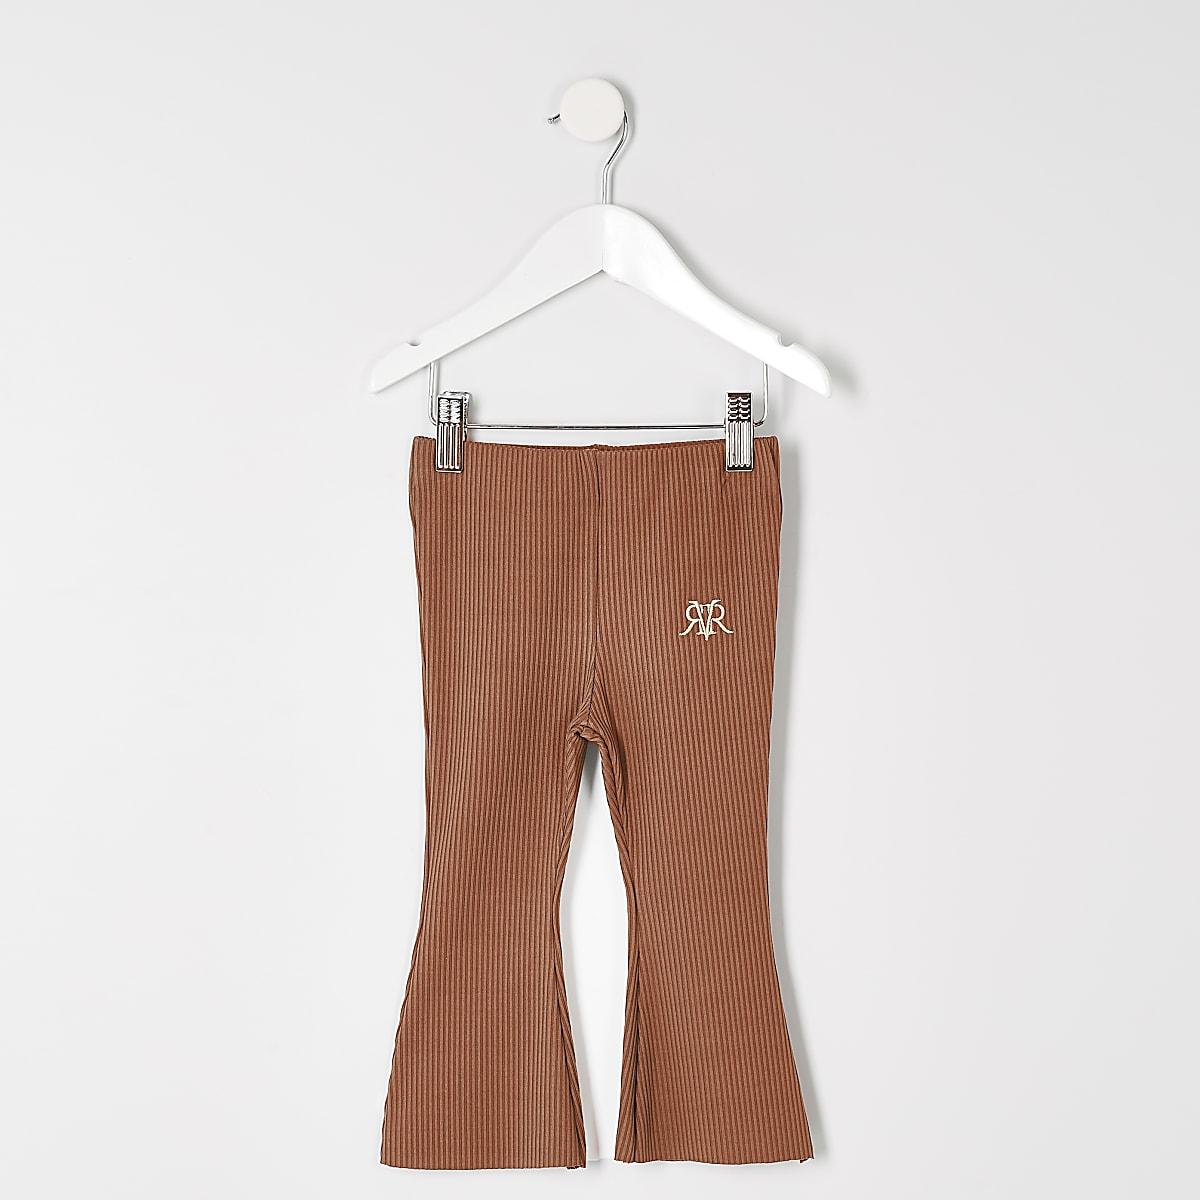 Mini - Roestbruine geribbelde uitlopende broek voor meisjes